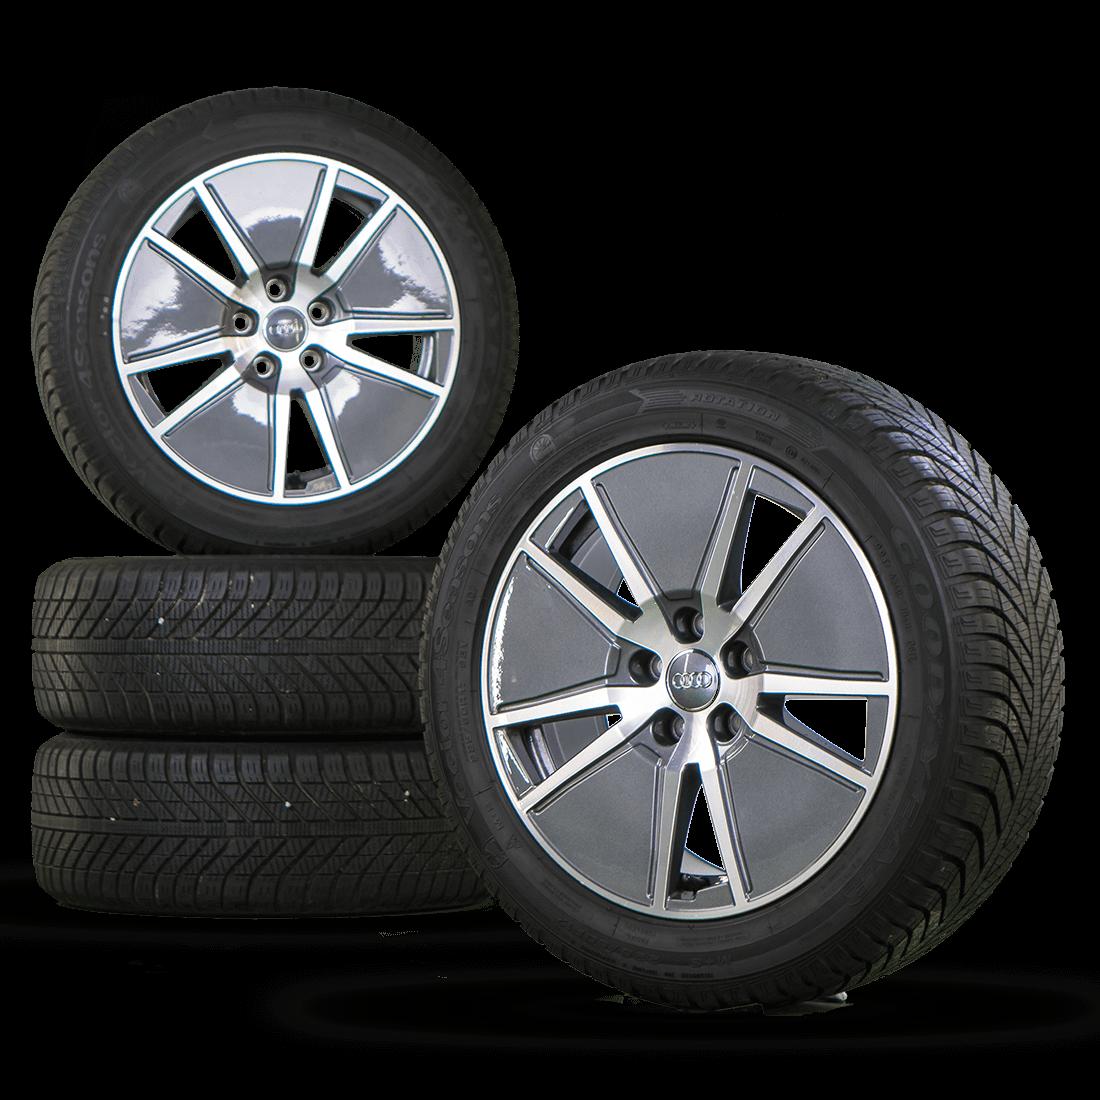 Audi 17 Inch Rim A4 8W Alloy Wheels Aero Allwetterreifen